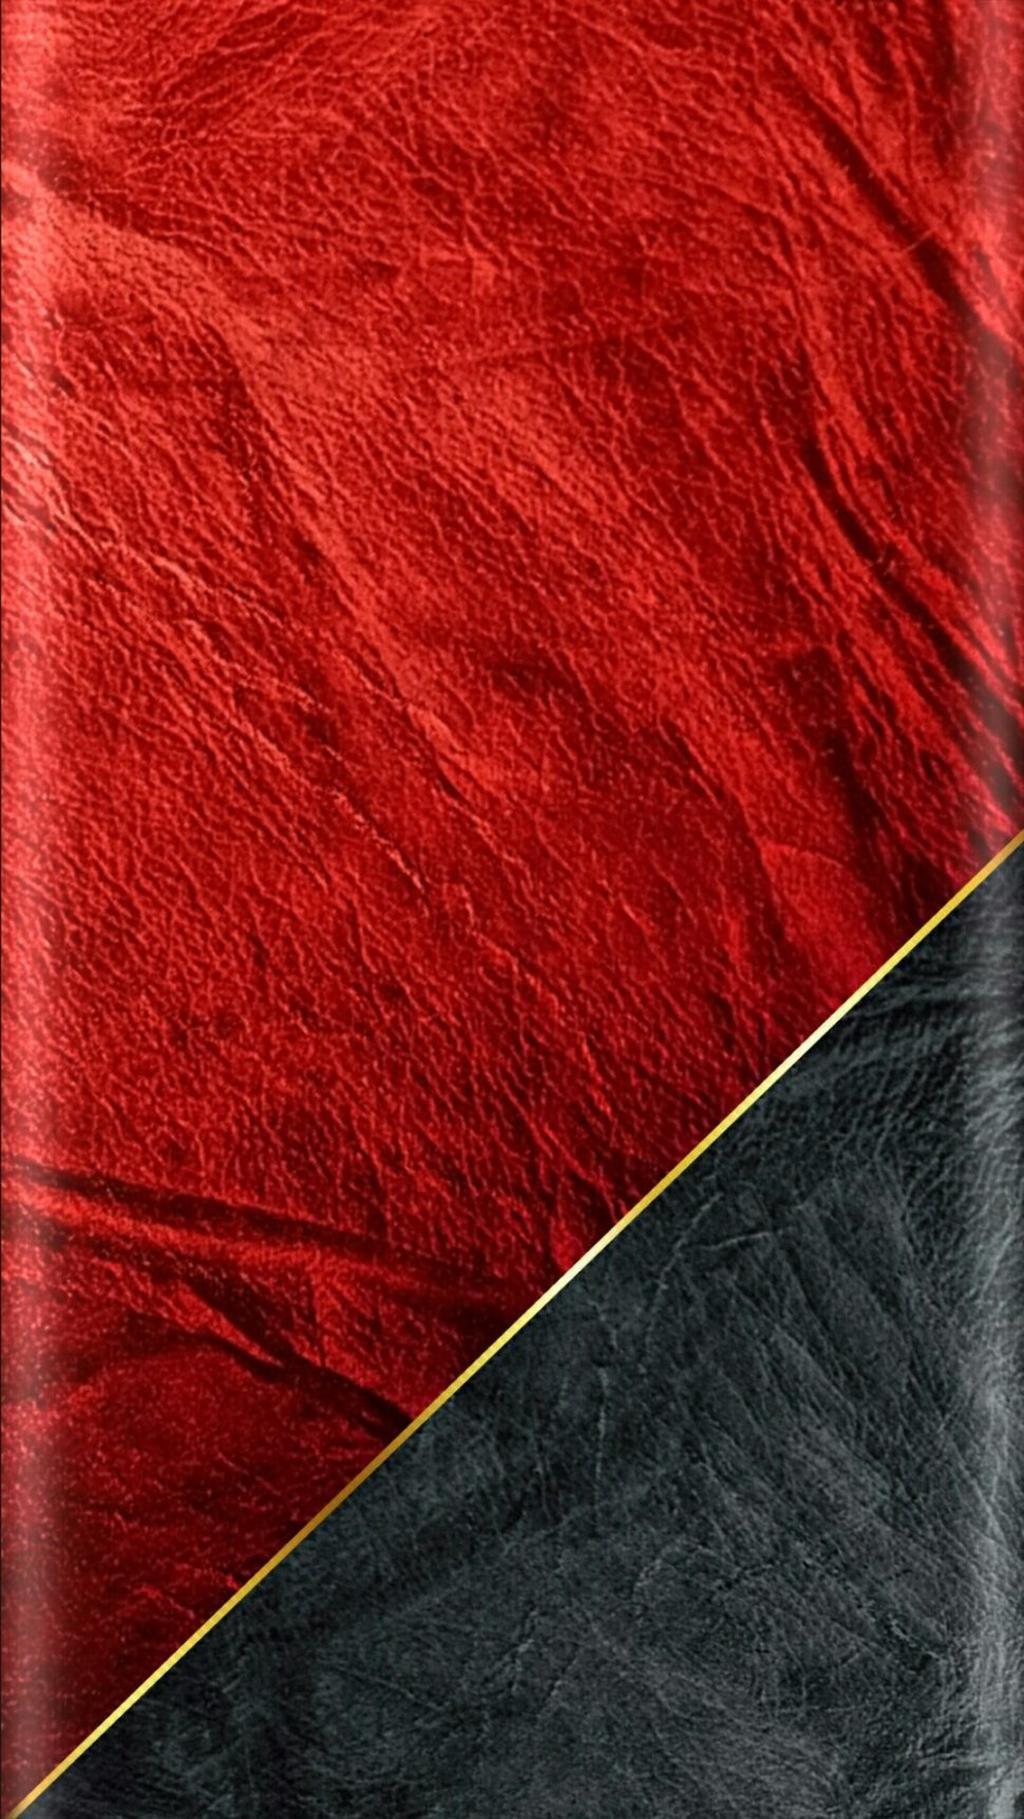 Plain Red Marble Wallpaper Hd 851088 Hd Wallpaper